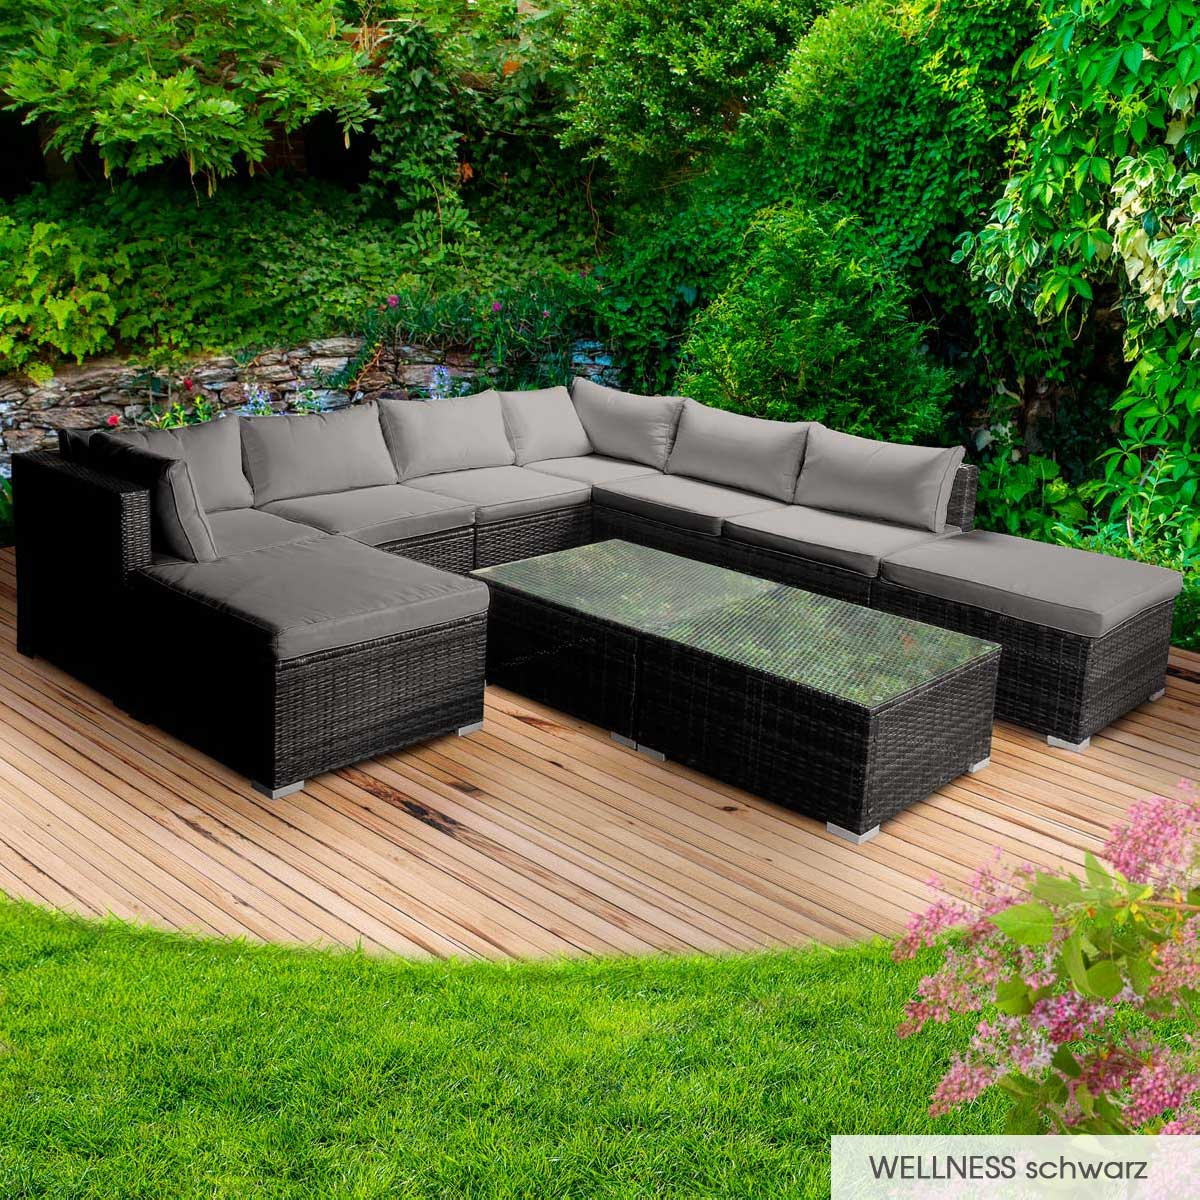 Gartenmoebel-Poly-Rattan-Lounge-Moebel-Sitzgarnitur-Gartengarnitur-Sitzgruppe-Sofa Indexbild 40